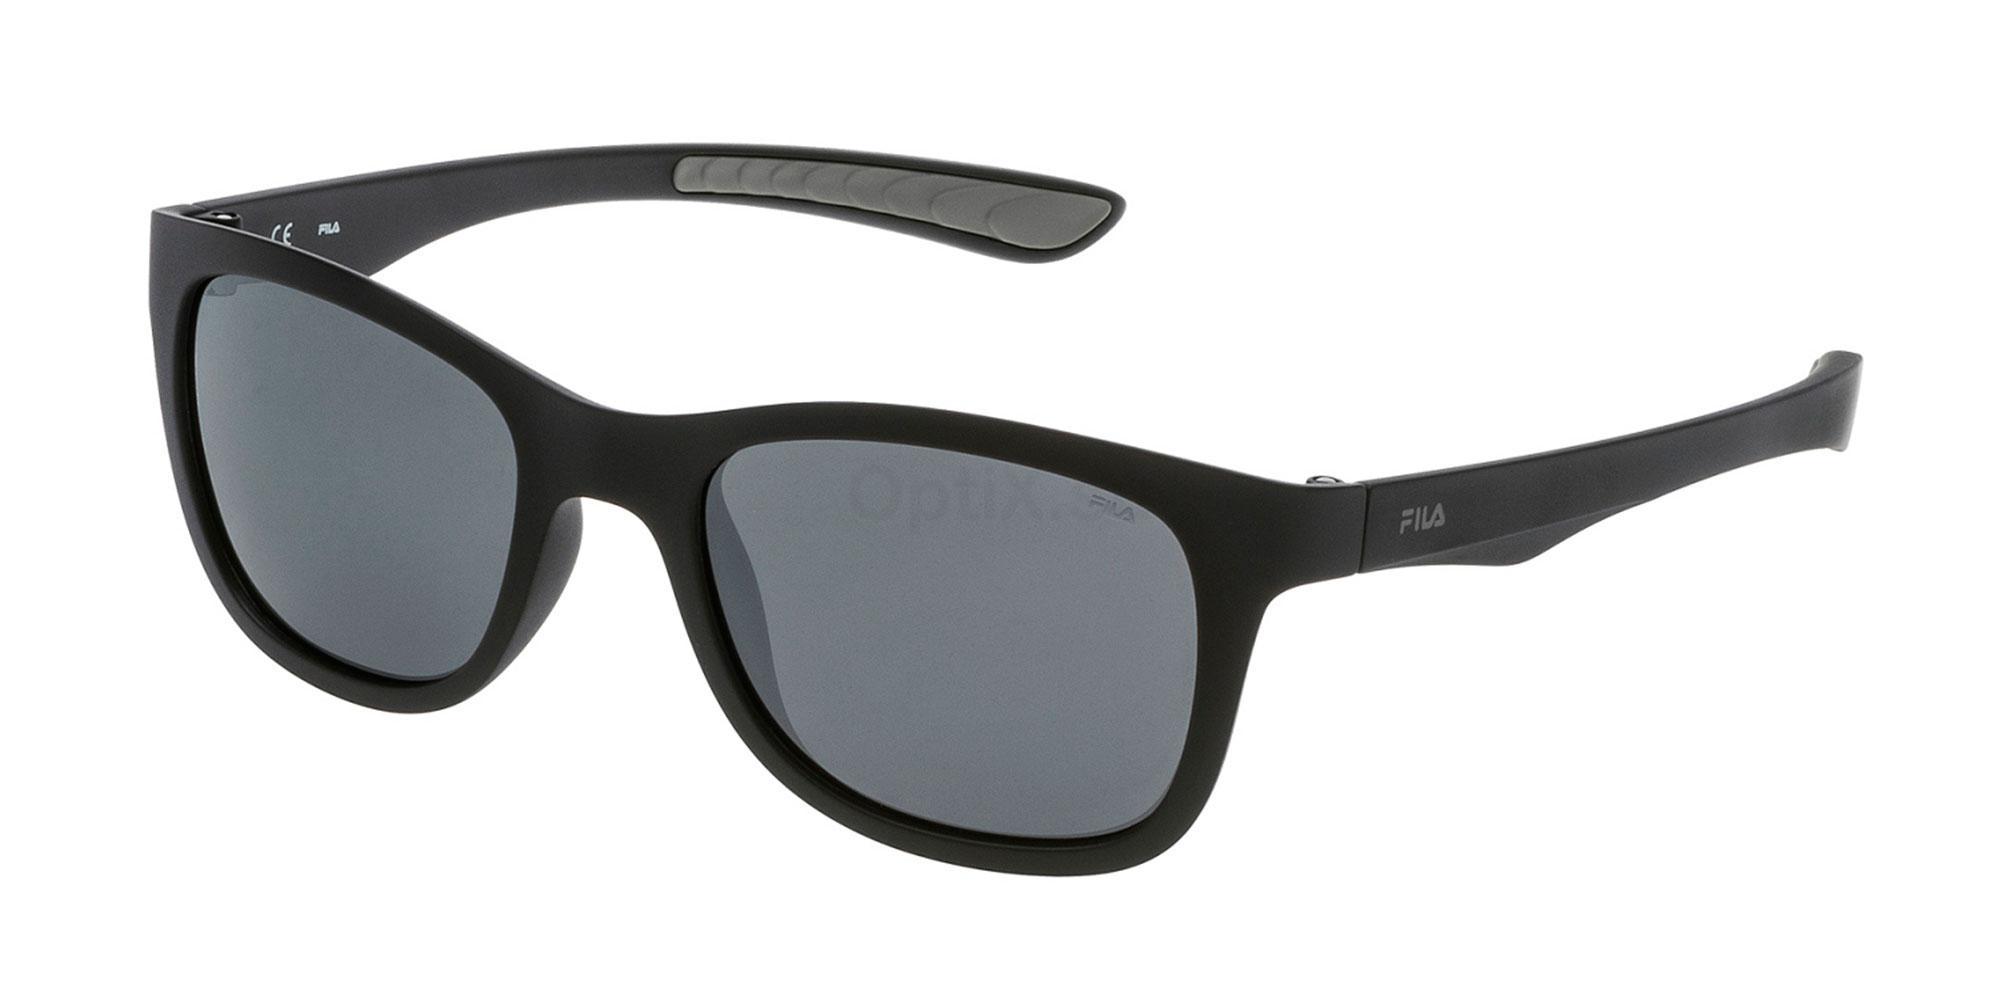 700P SF9050 Sunglasses, Fila